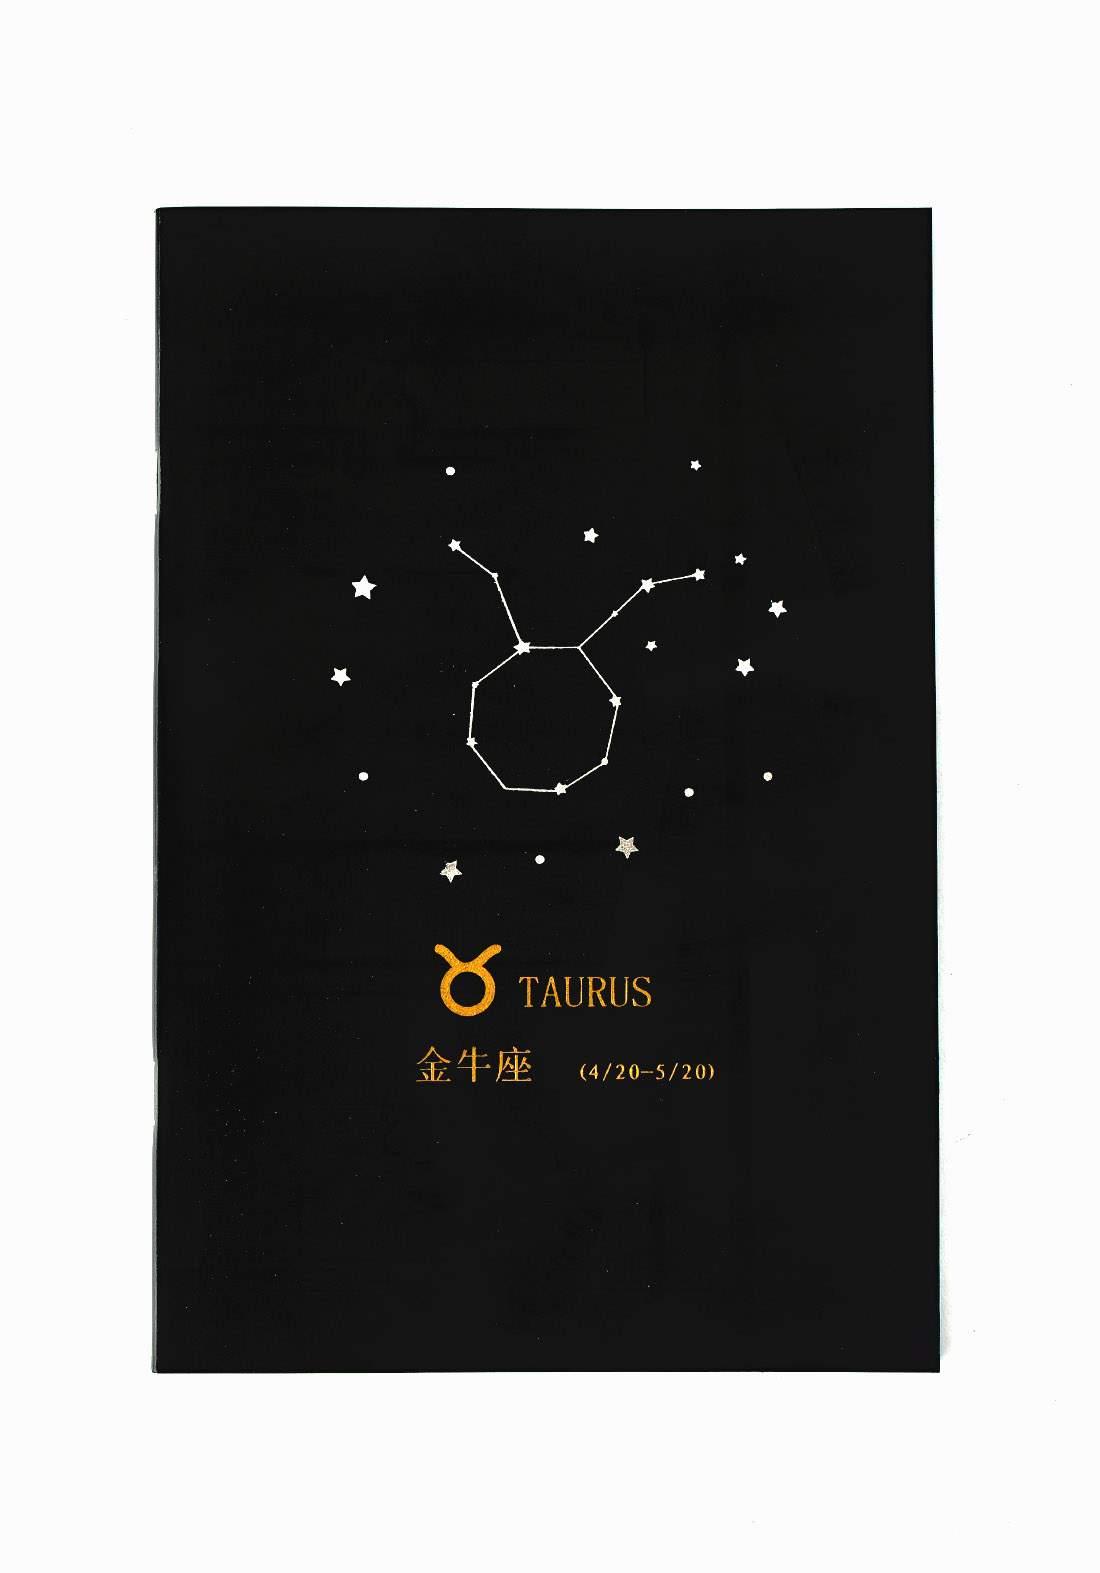 Small Black Drawing Book 24 Sheets-Taurus دفتر رسم اسود صغير بطبعة برج الثور